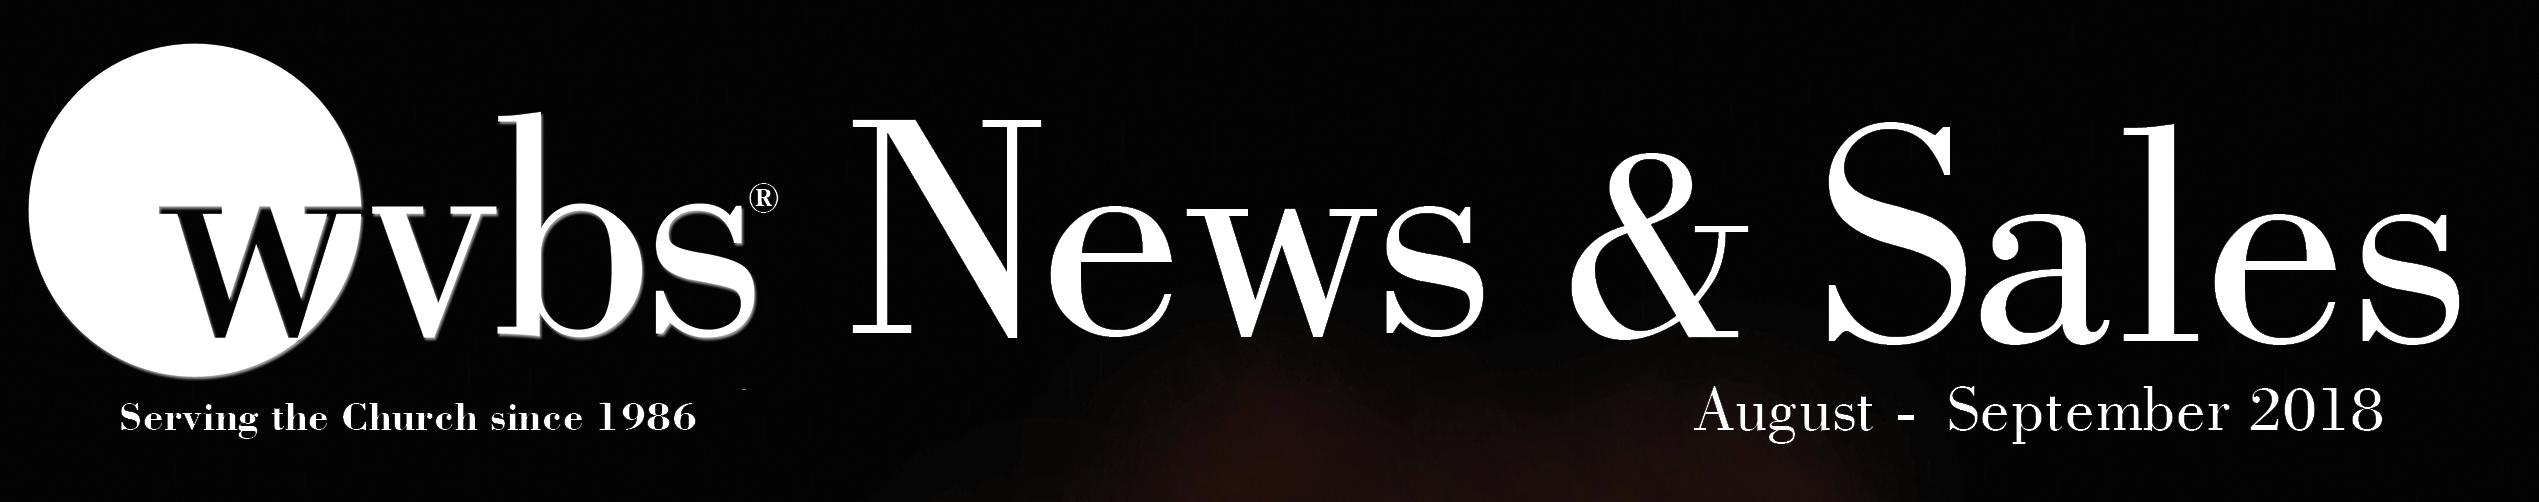 World Video Bible School Newsletter